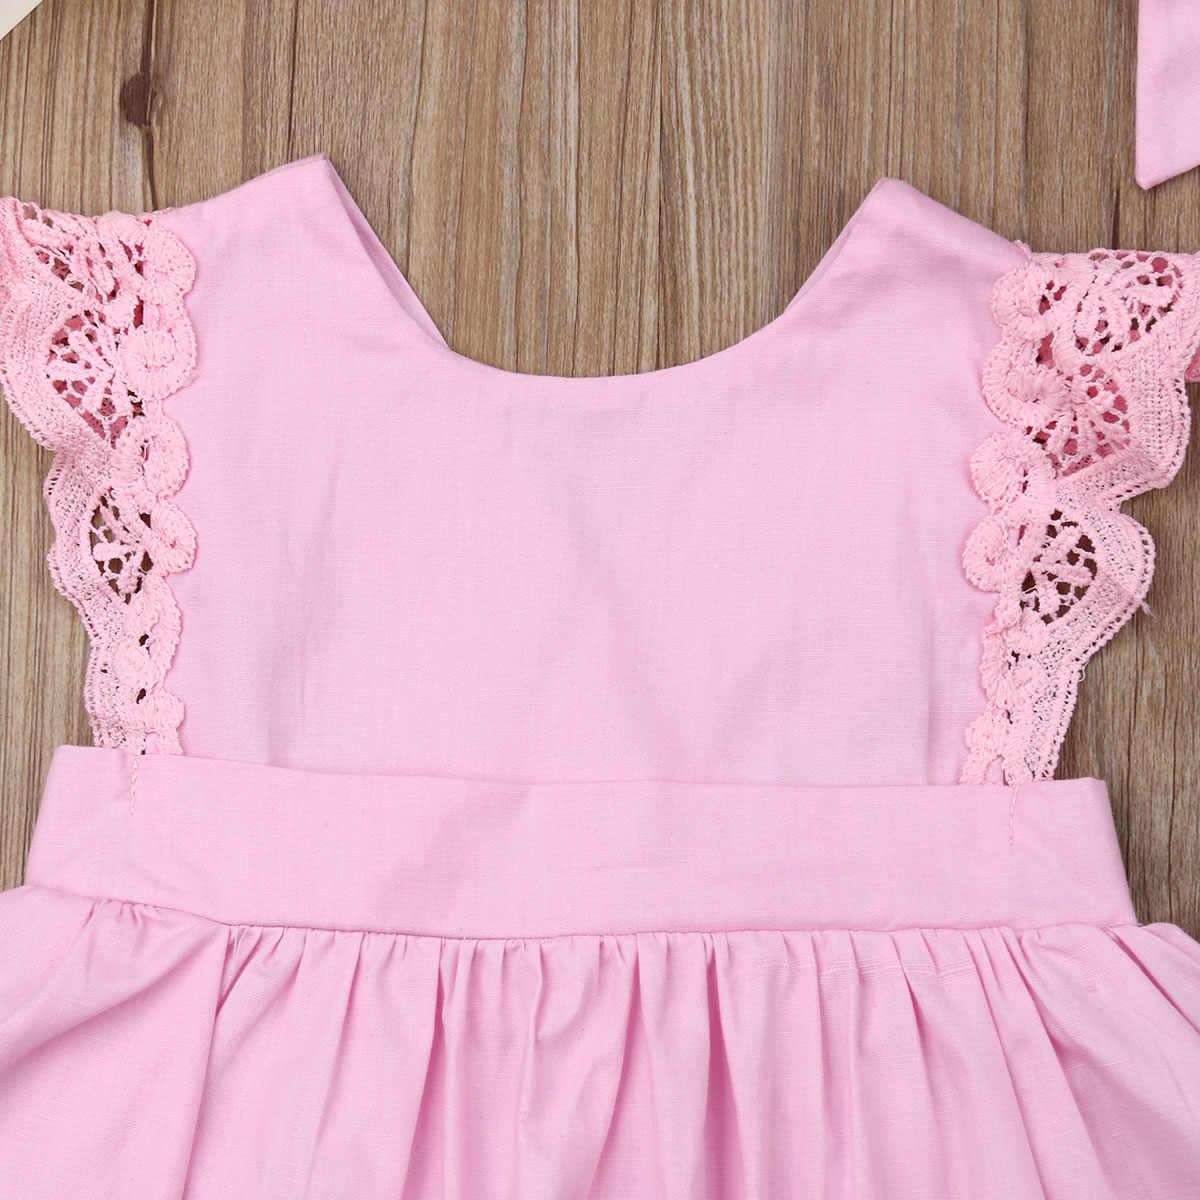 Pasgeboren Kid Baby Meisjes Kant Kleding Solid Jumpsuit Bodysuit Outfit Set